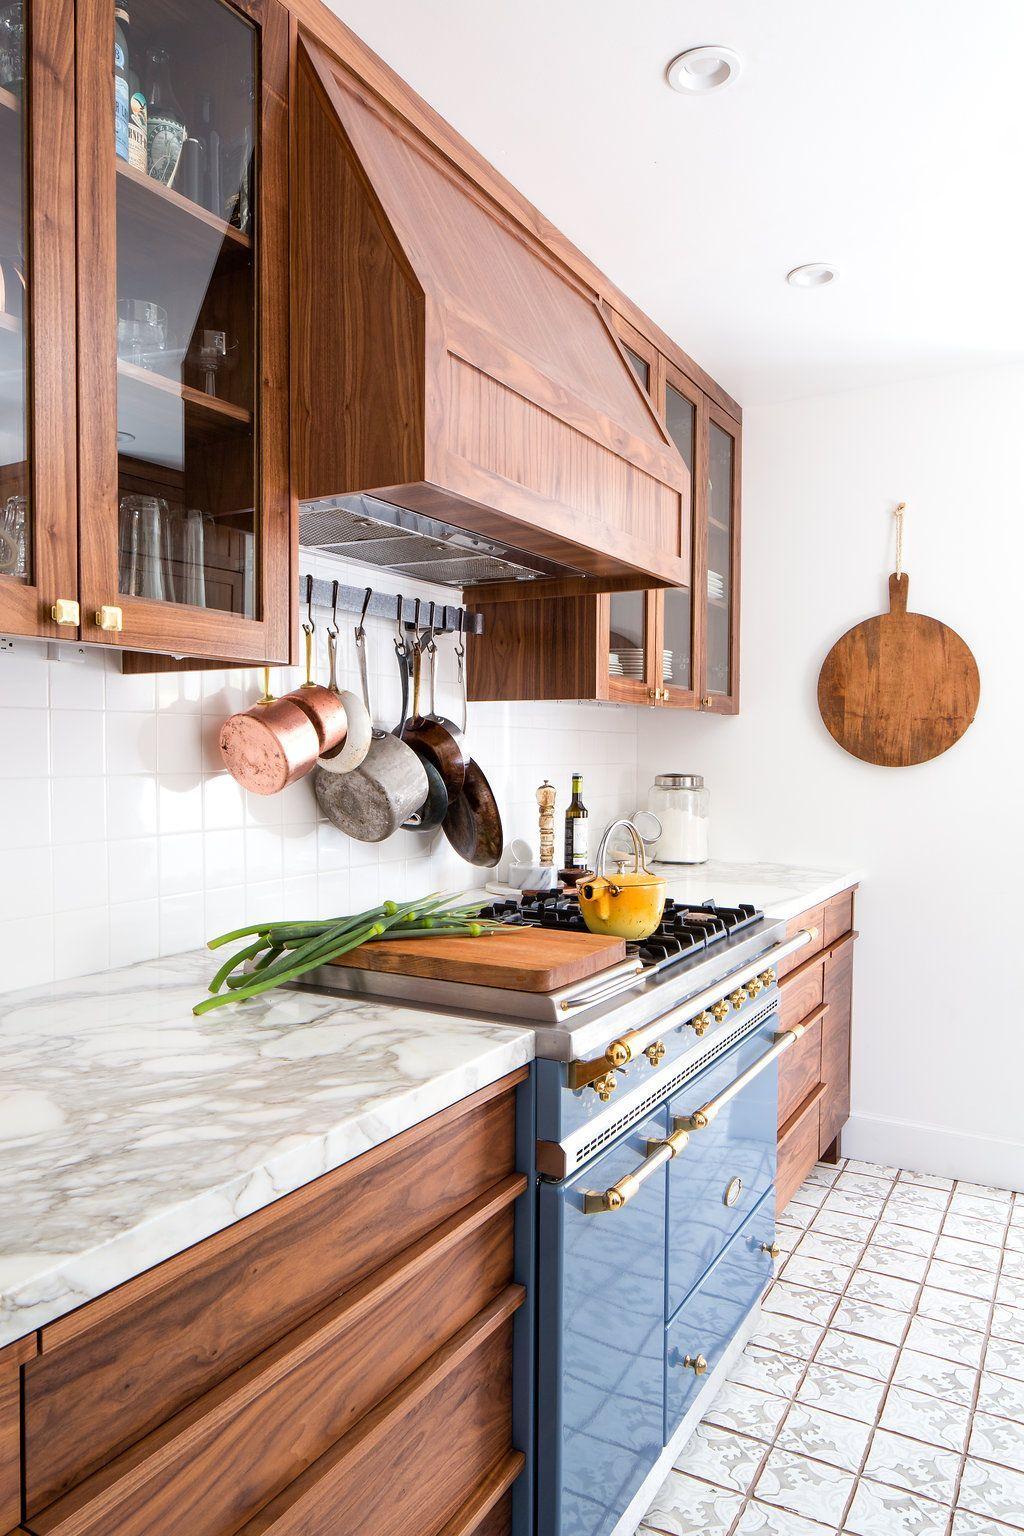 Pin by Vanesa Dell Orto on casa campo | Pinterest | Kitchens, White ...